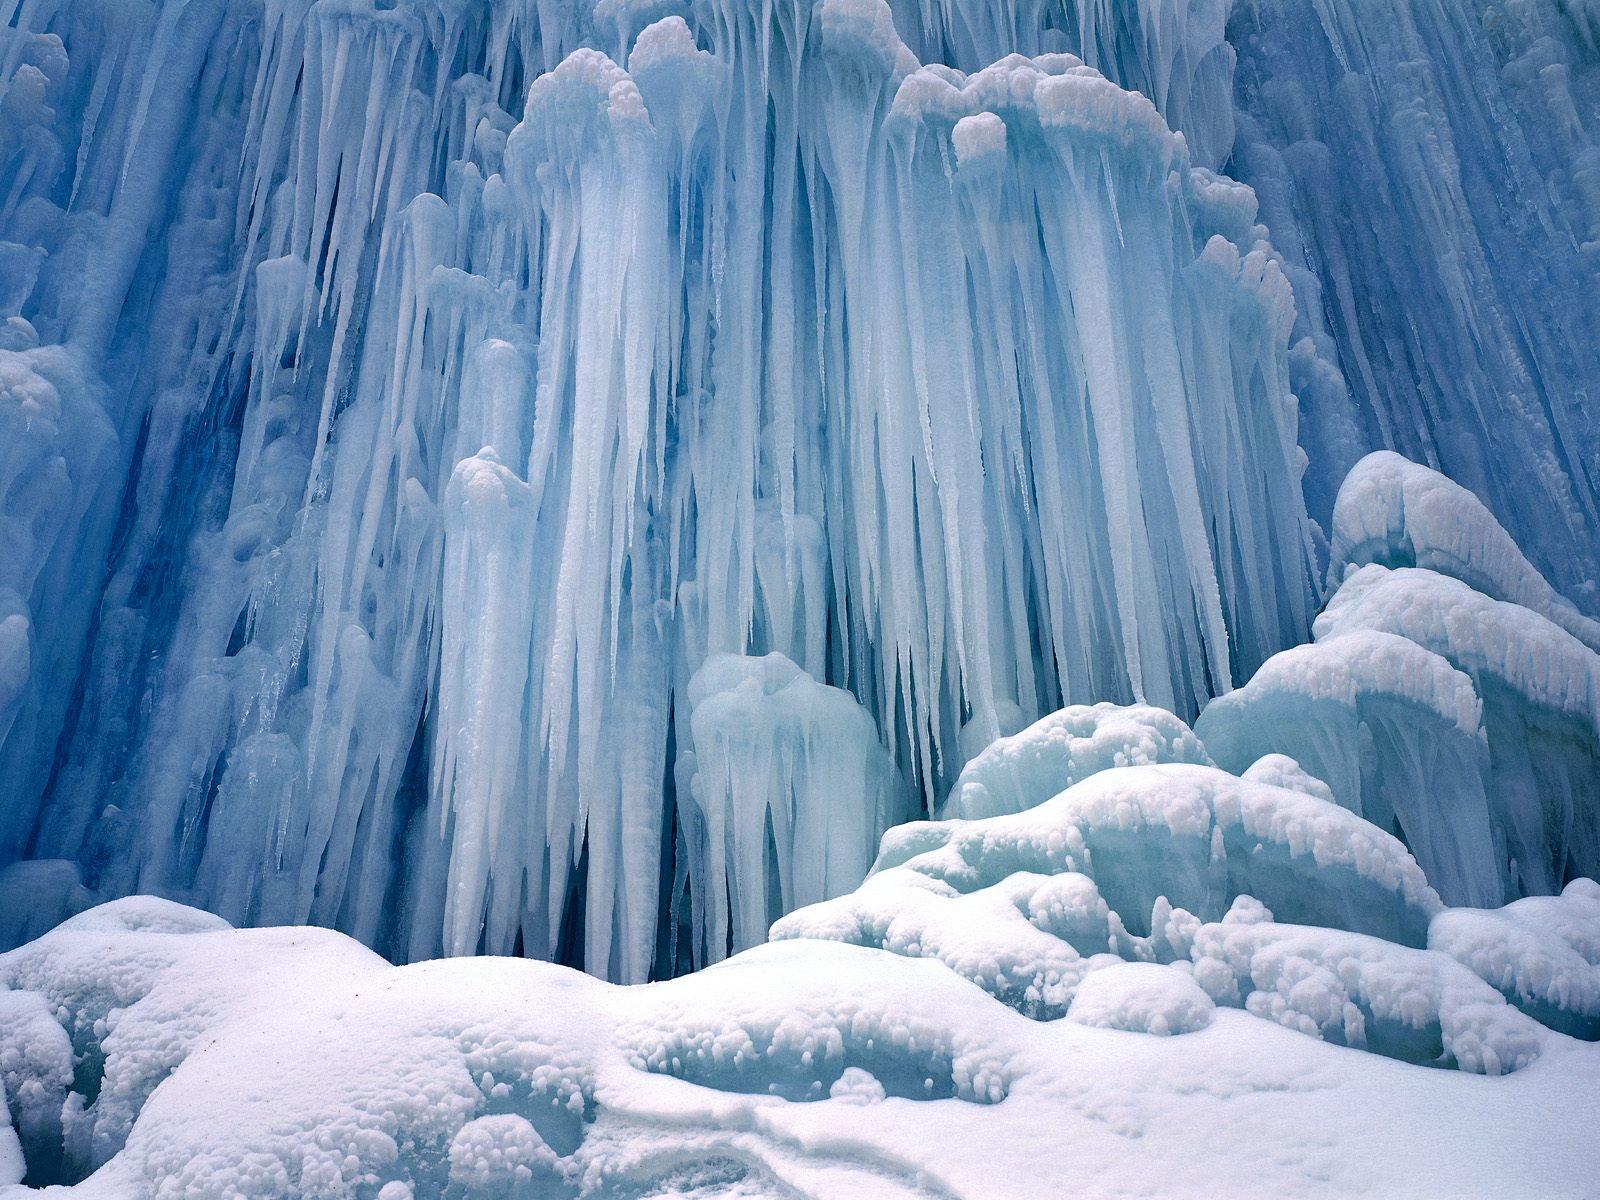 http://3.bp.blogspot.com/-pcnjTjv1ZT4/TbWduz3UjDI/AAAAAAAACdY/_-k9xhcaB6s/s1600/Ice_Castle_Waterfall_-_Yoho_National_Park%252C_British_Columbia.jpg